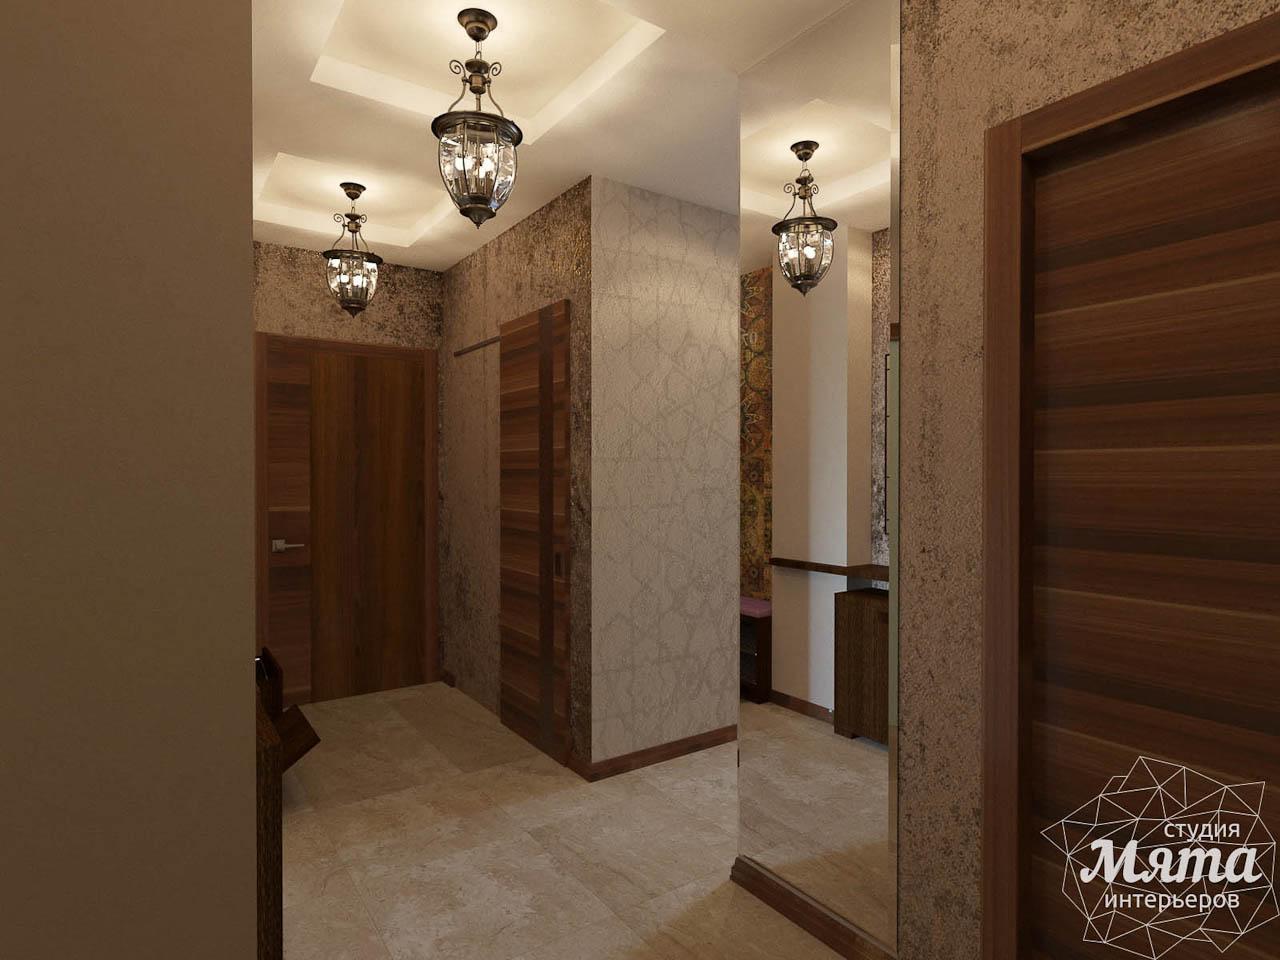 Дизайн интерьера трехкомнатной квартиры по ул. Мельникова 27 img1767110226